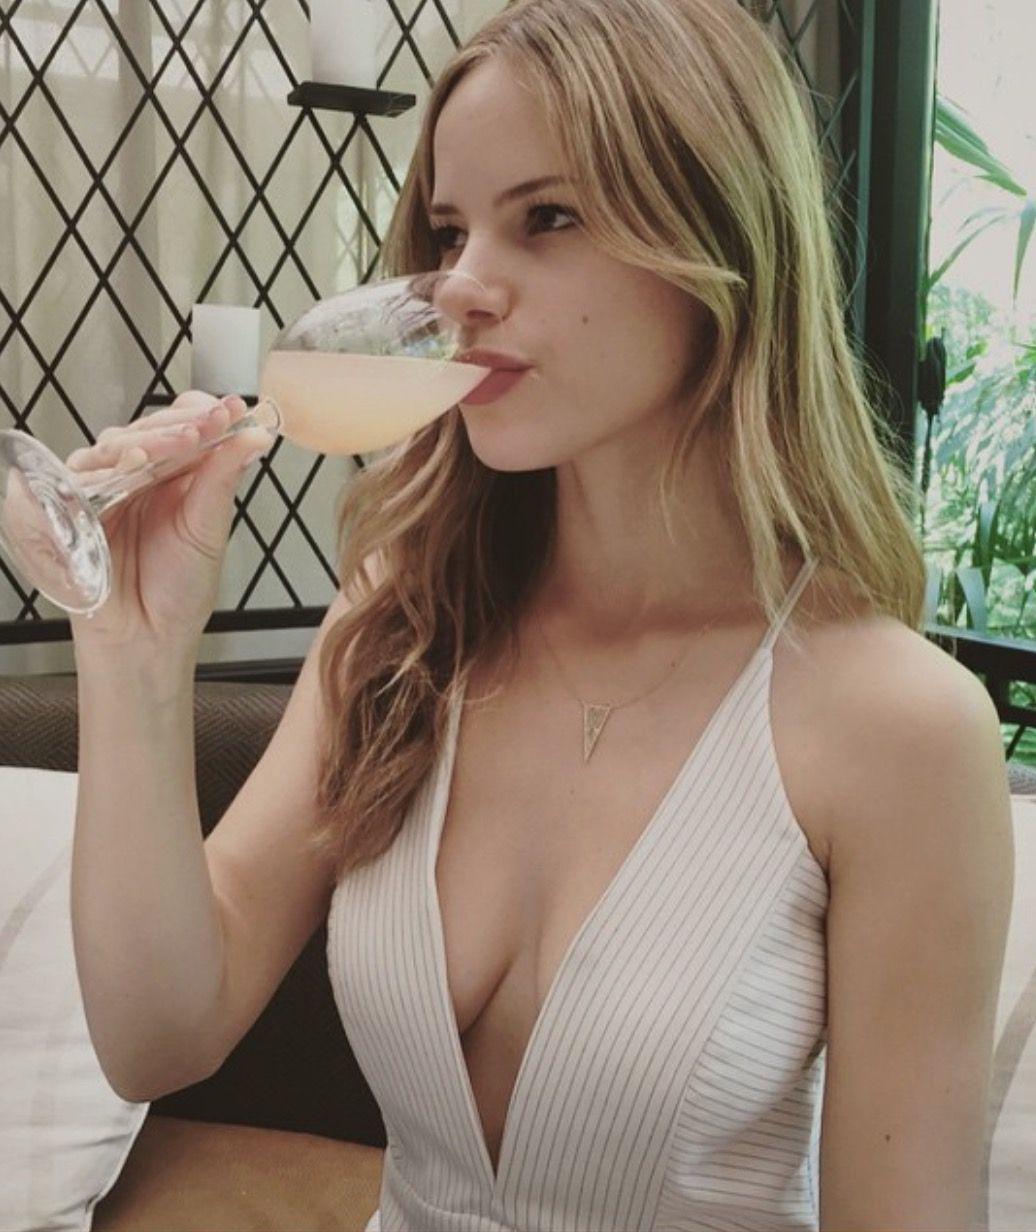 Sex Mona nudes (63 photos), Ass, Is a cute, Instagram, braless 2006